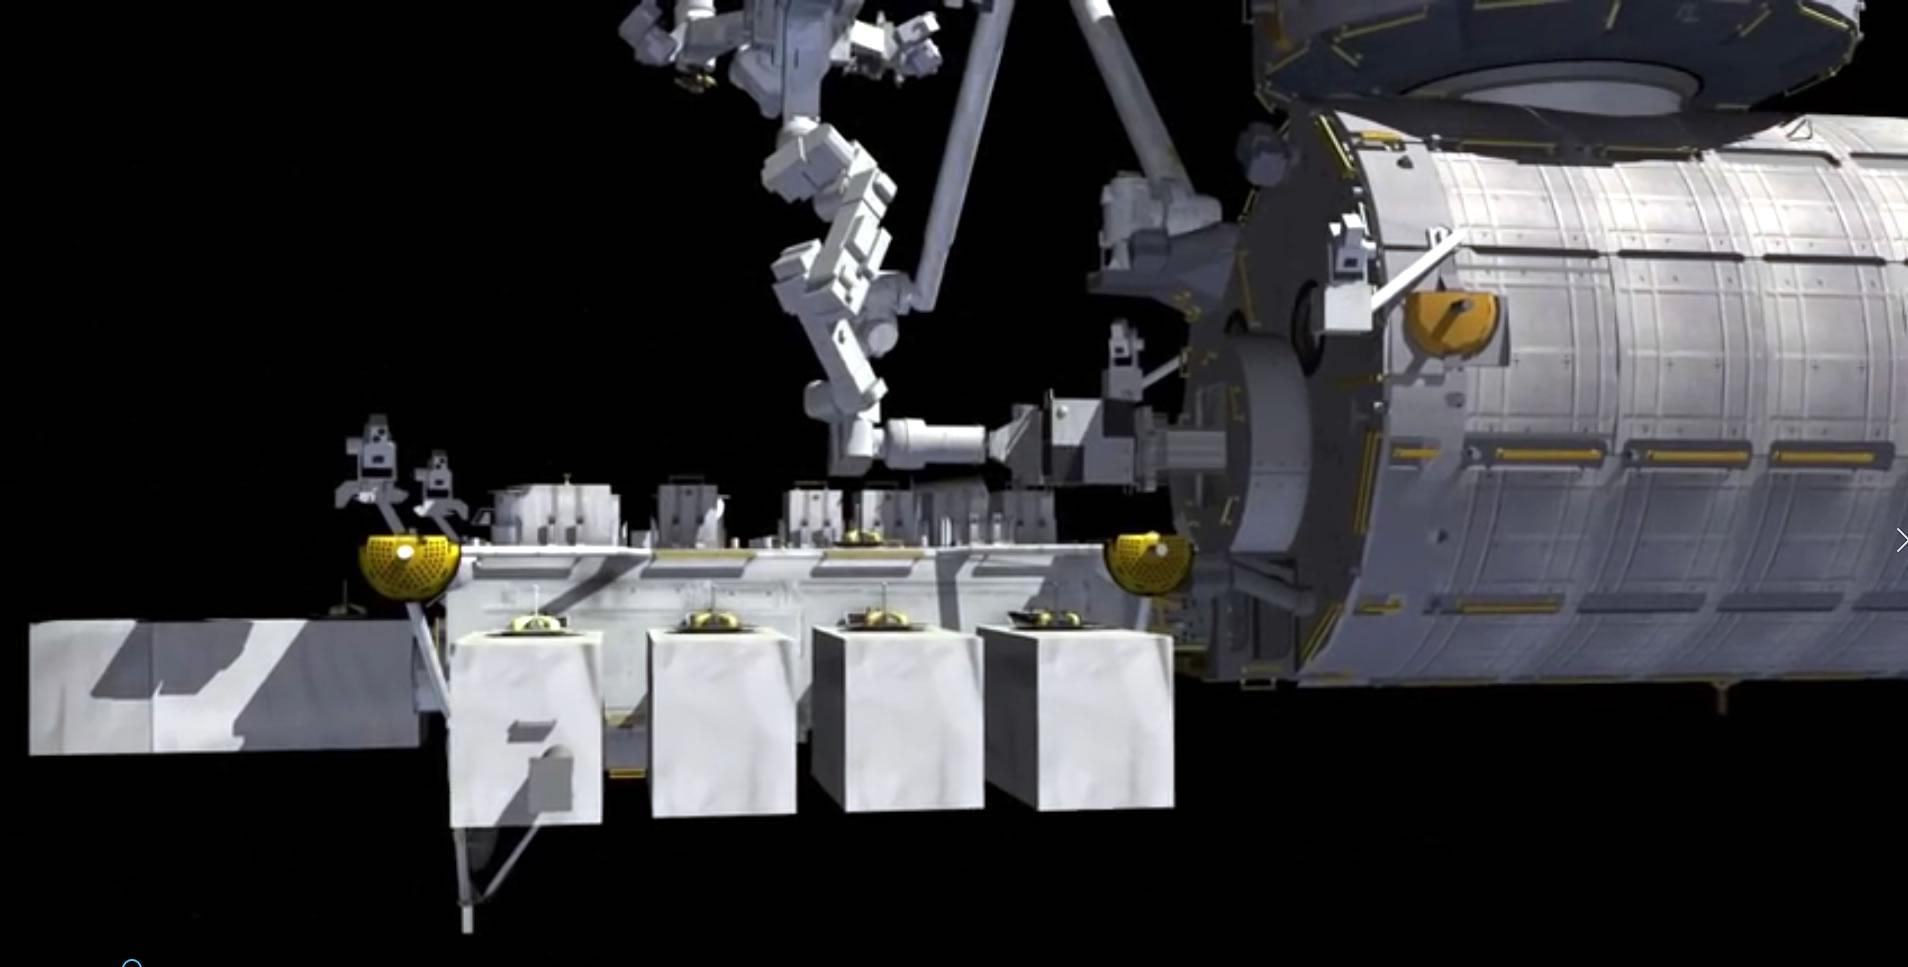 SSIKLOPS Satellite deployment